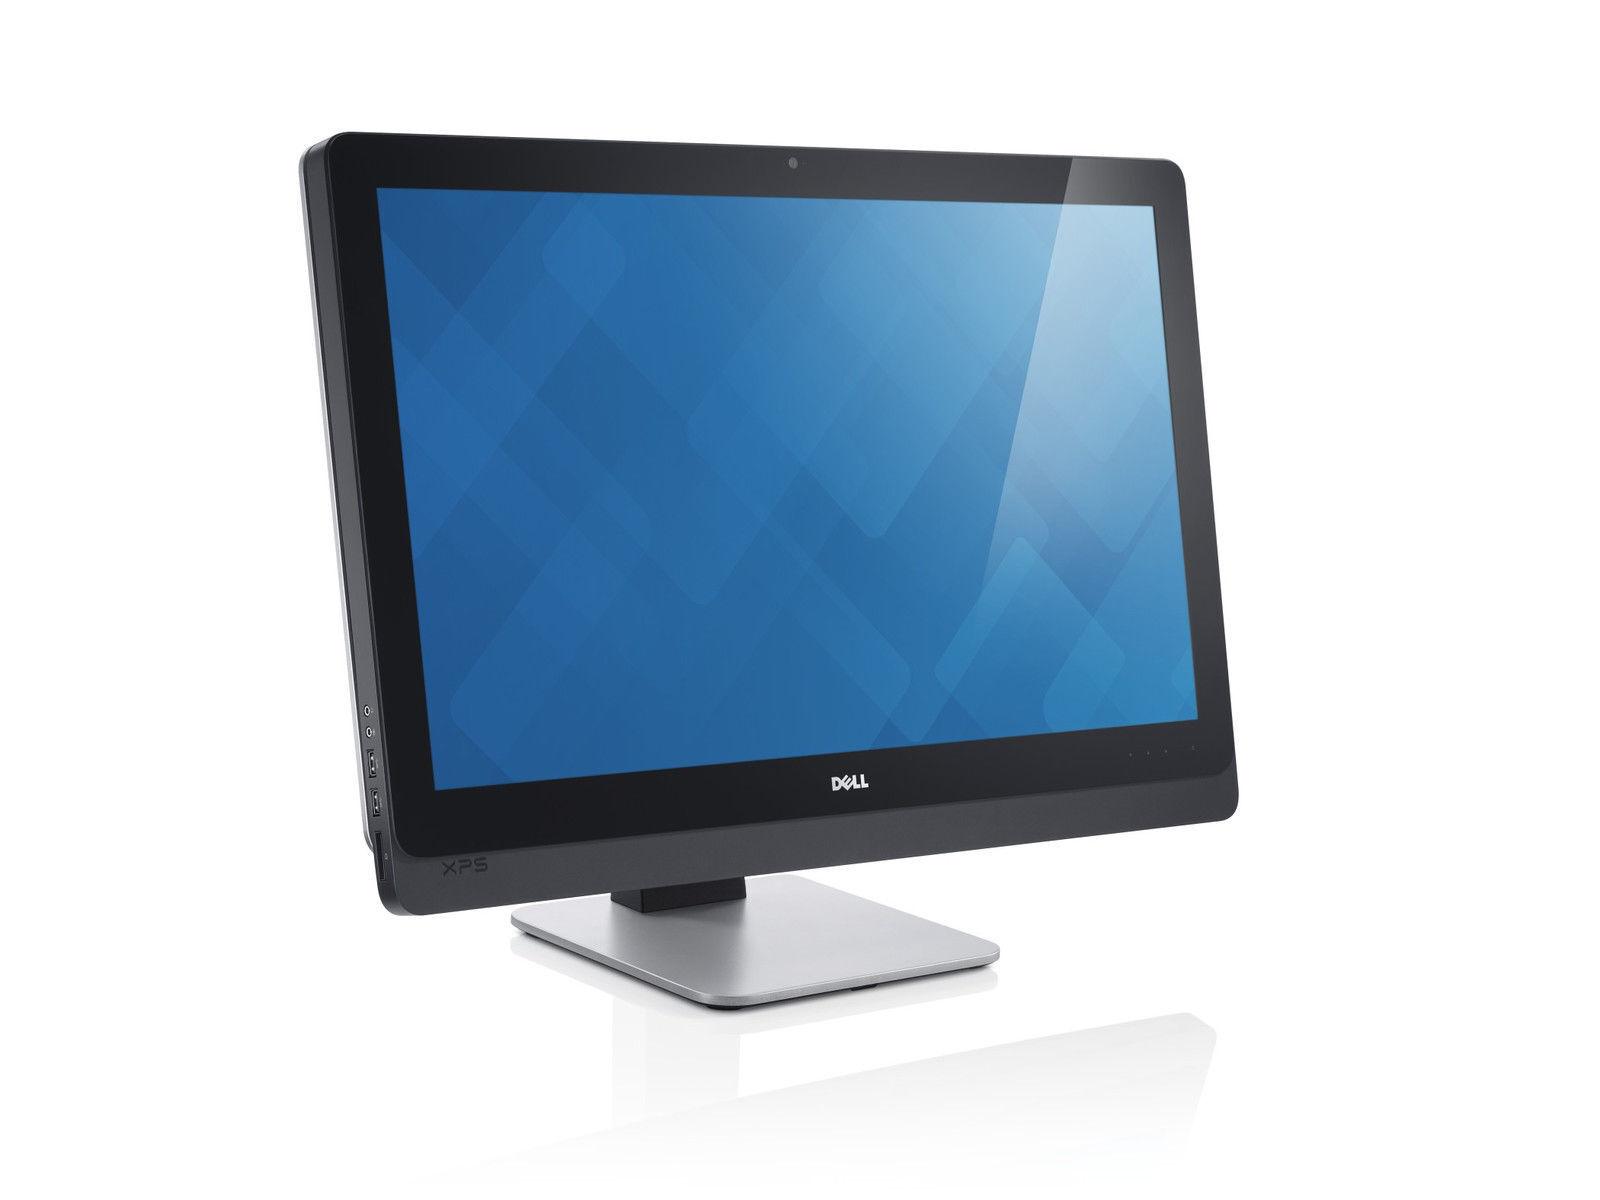 Dell XPS One 2710 Texas Instruments USB 3.0 Drivers Mac